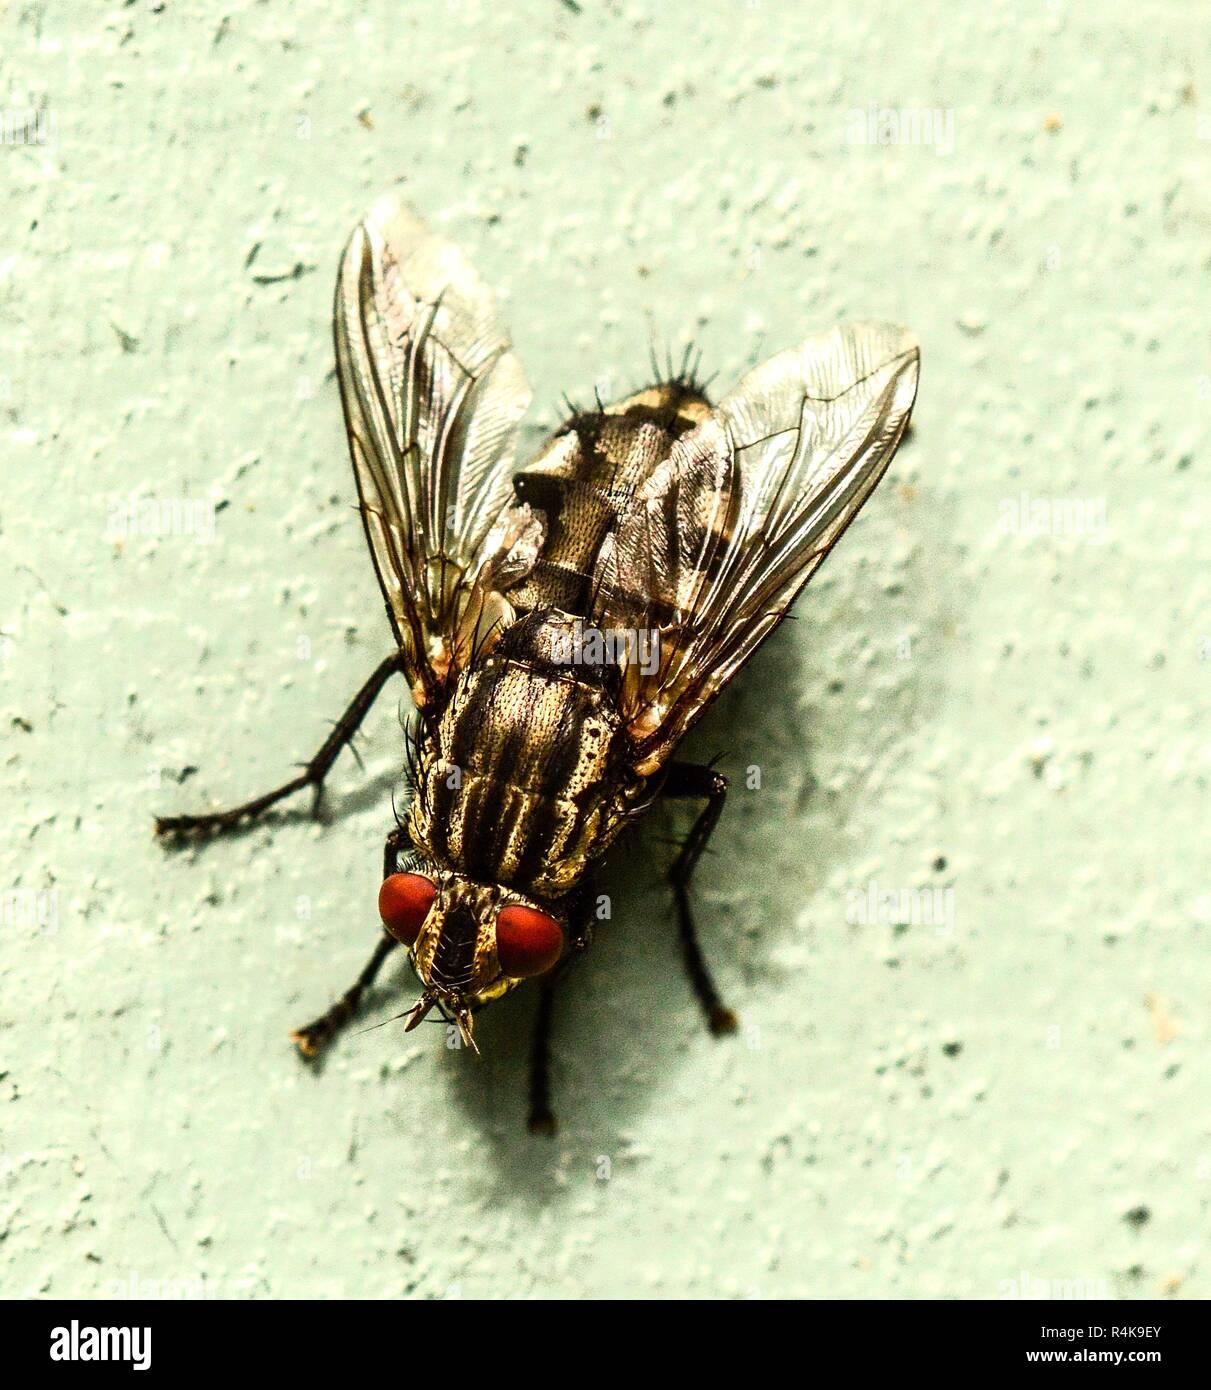 Flesh Fly - Diptera - Sarophaga carnaria Stock Photo